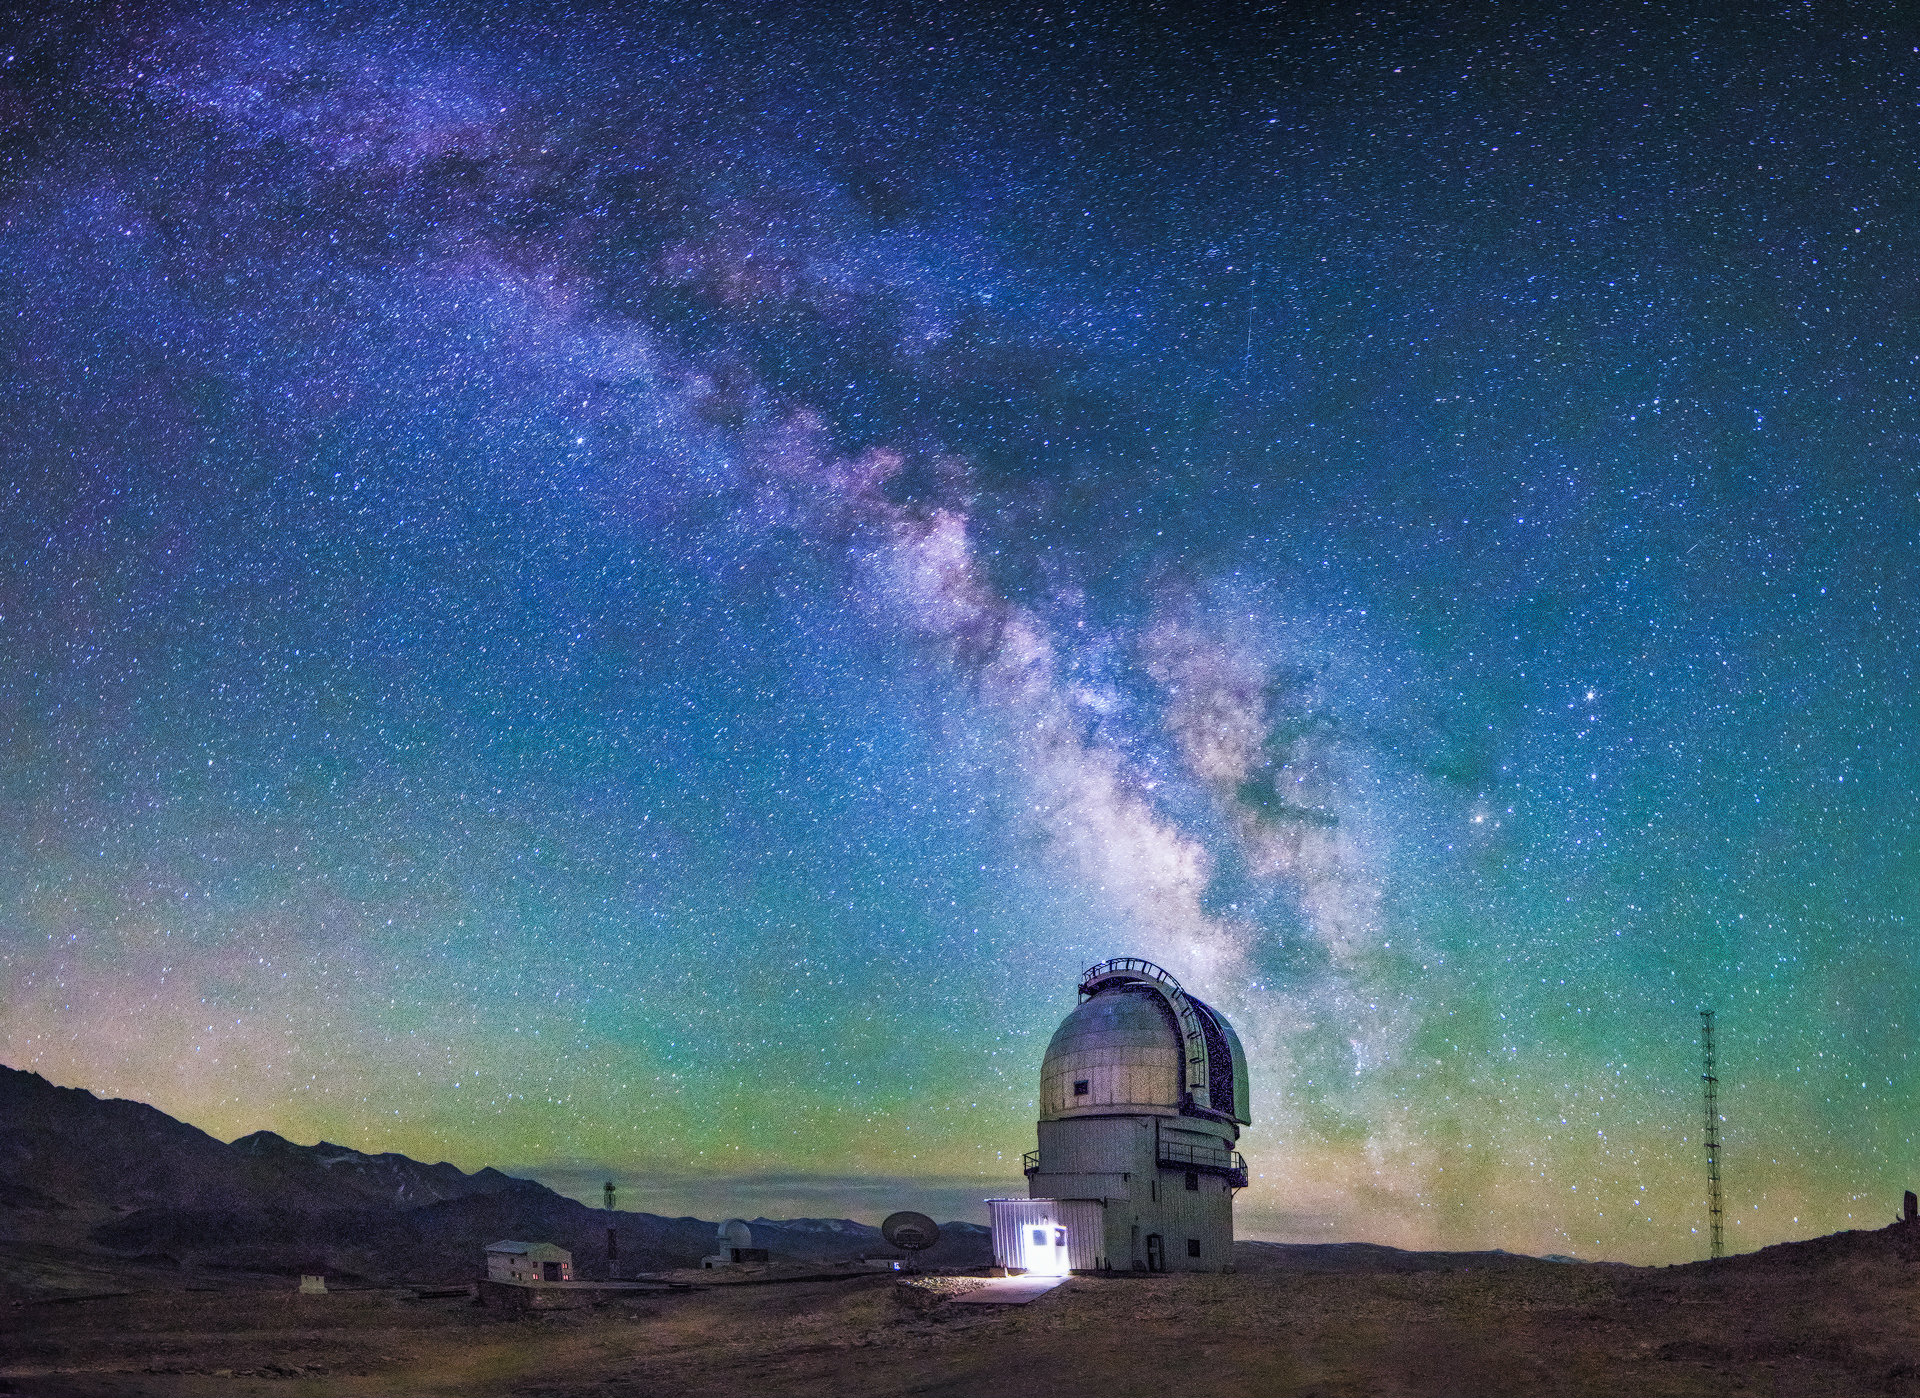 Himalayan Chandra Telescope (by sorcerer81)